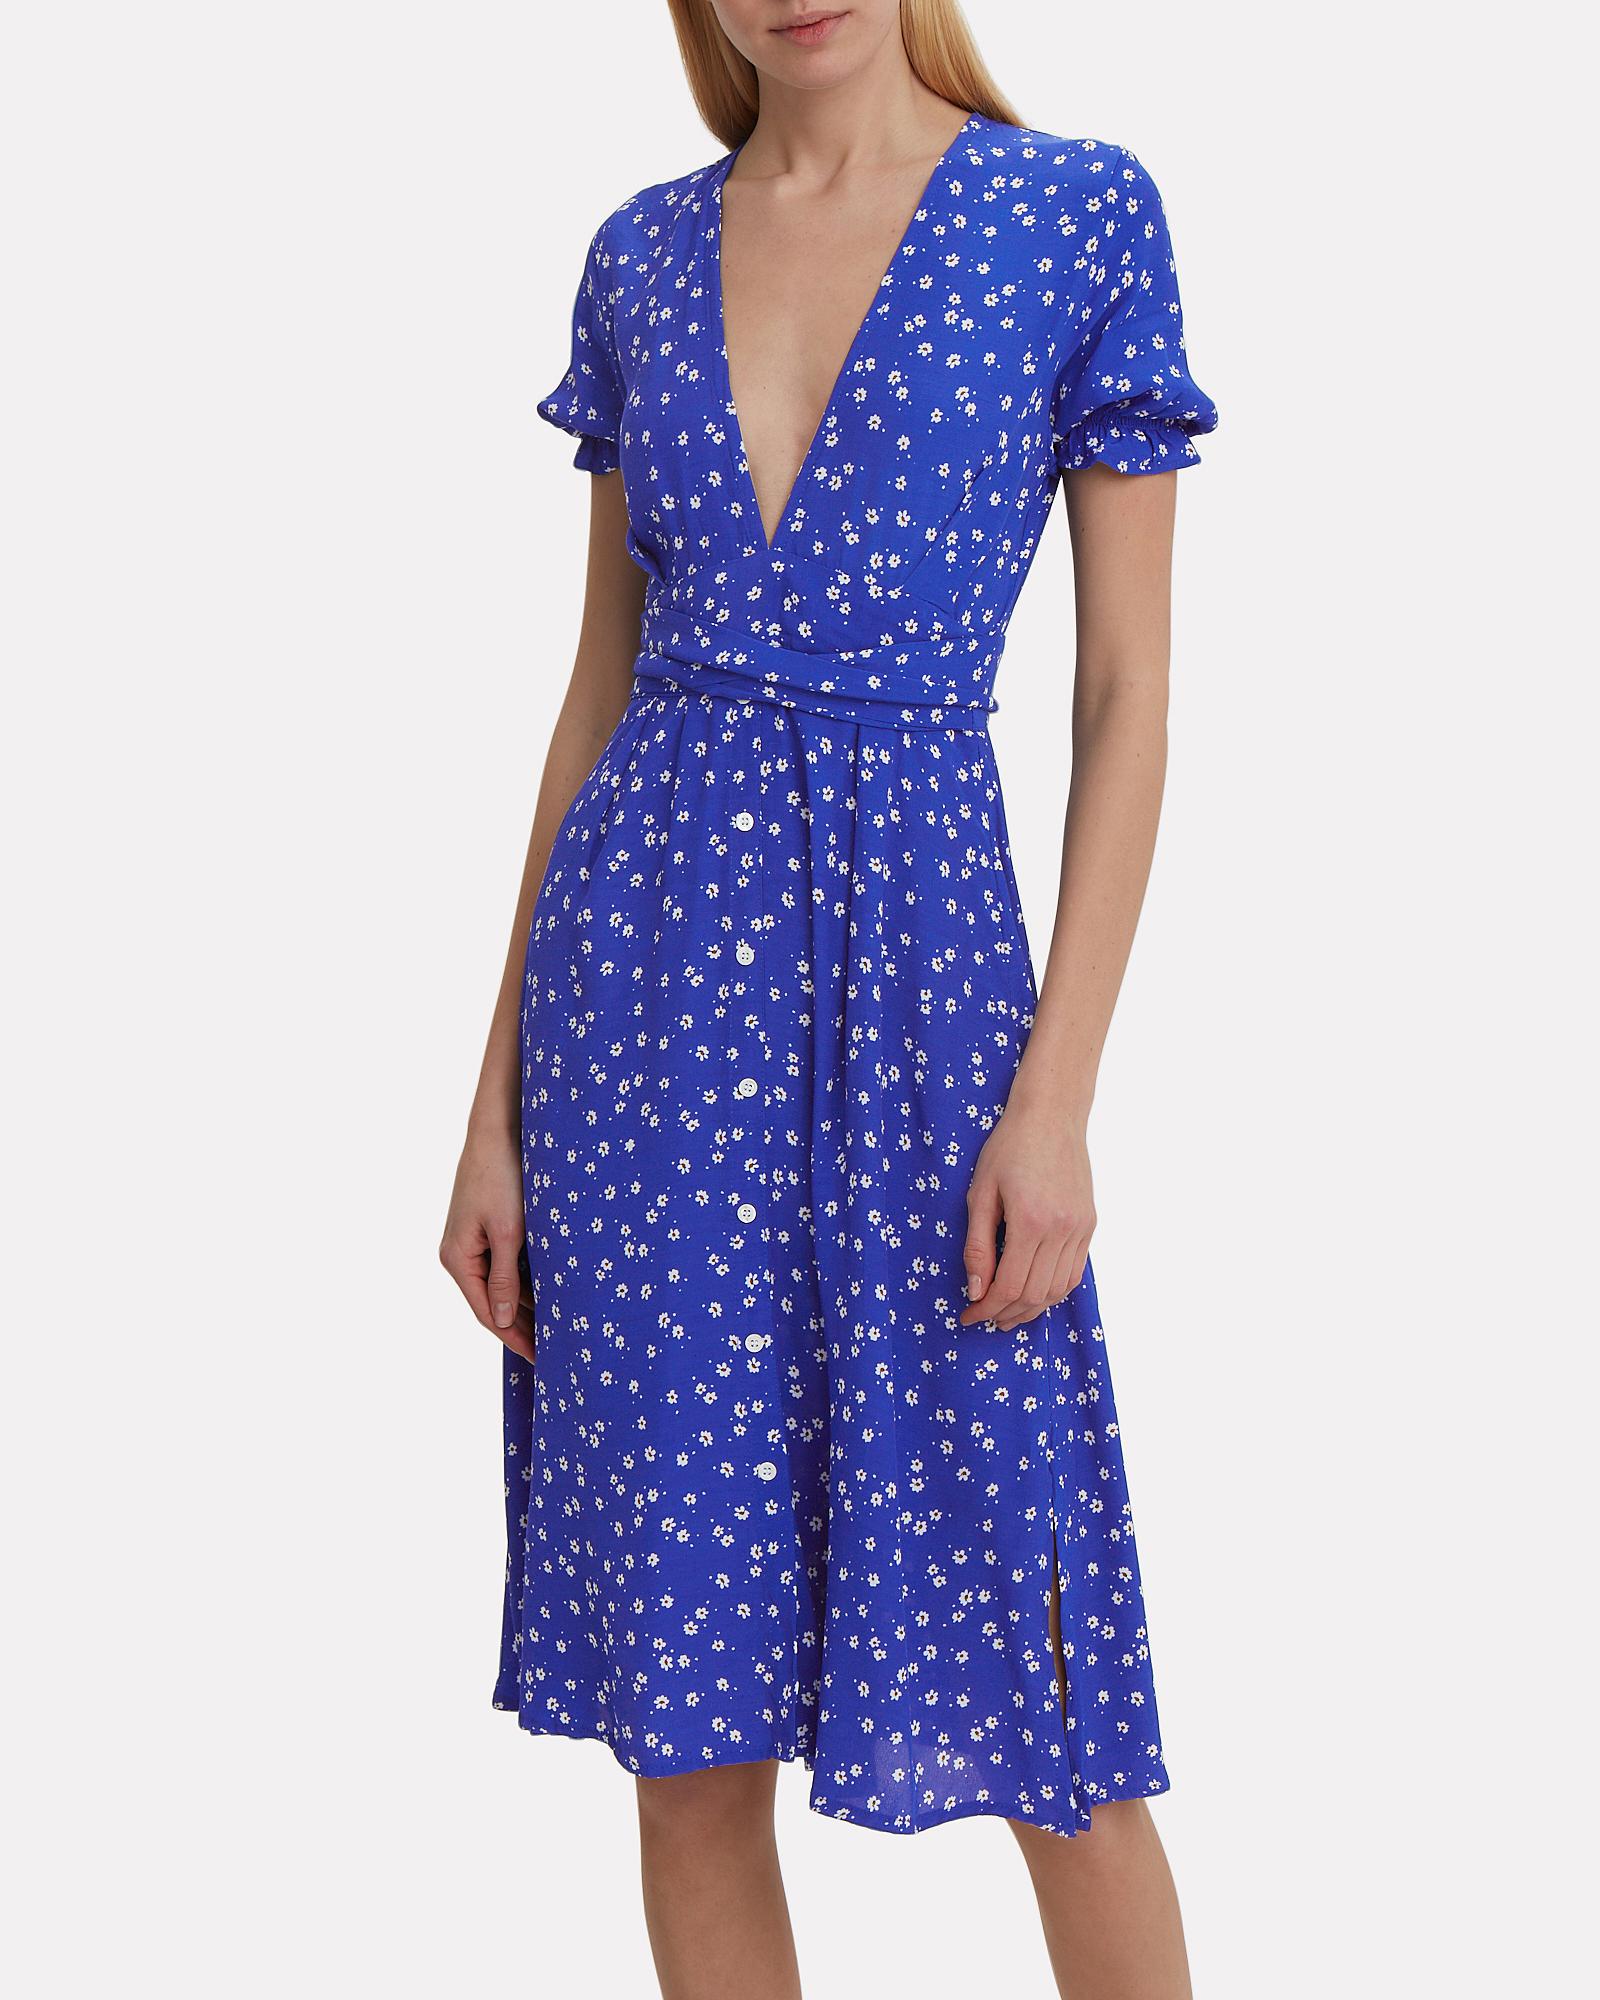 e3d2a1acd45 ... Farah Betina Print Cobalt Dress